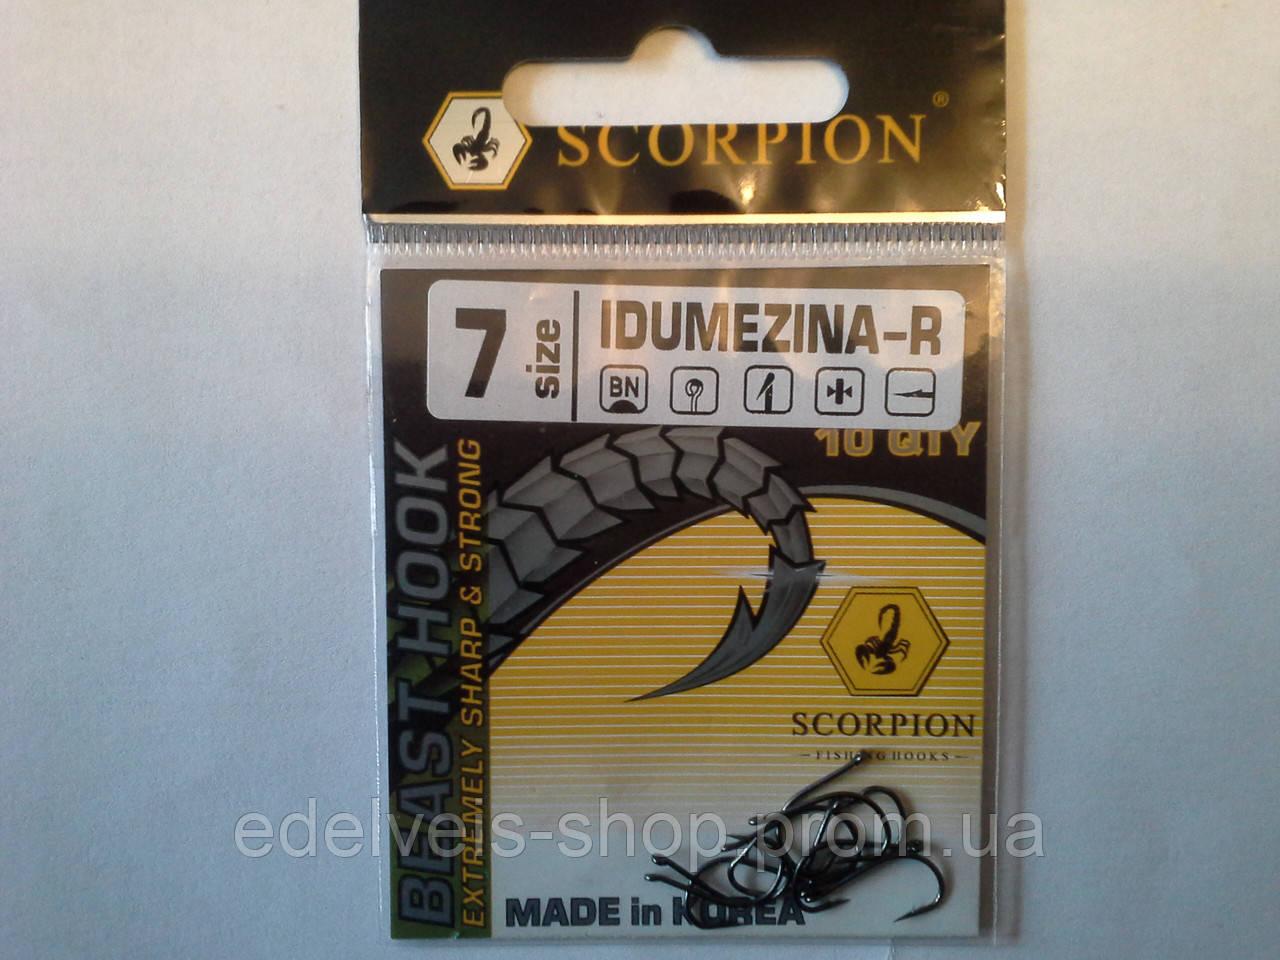 Крючки Bratfishing SCORPION IDUMEZINA  7